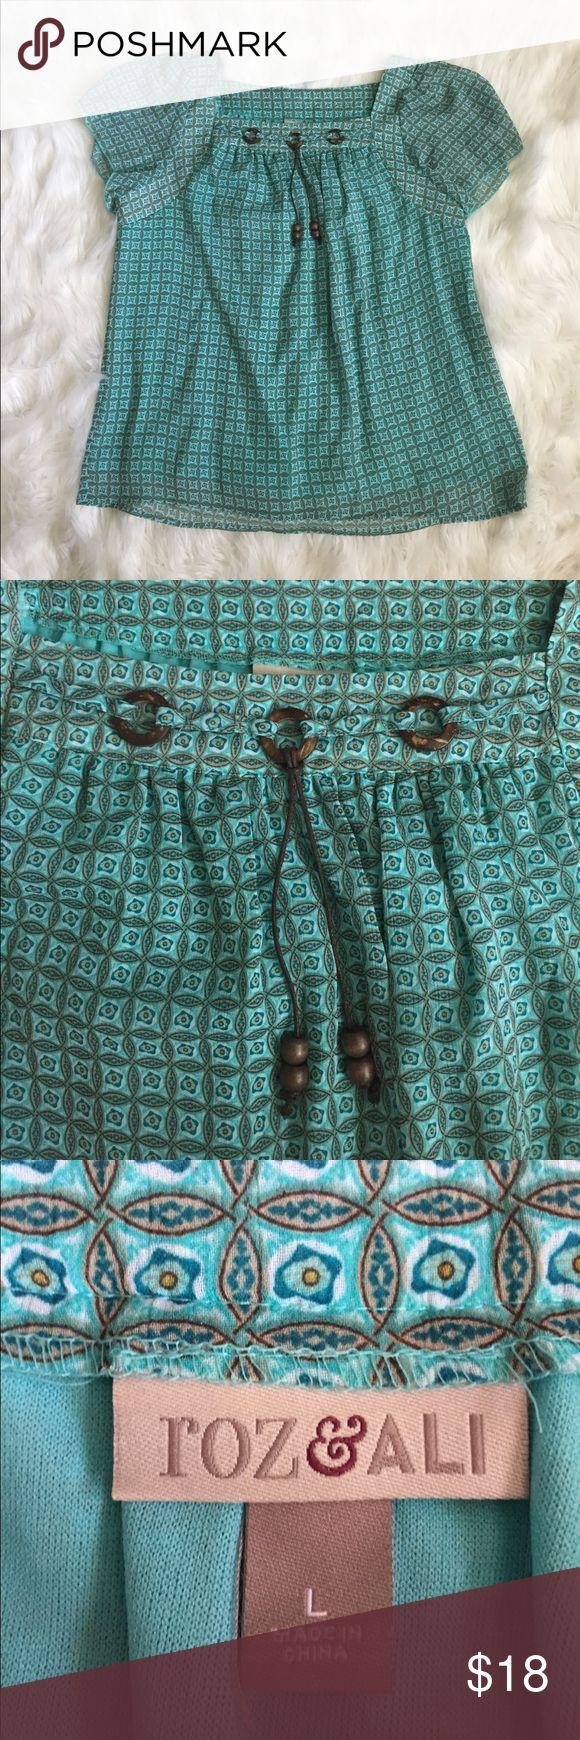 Roz & Ali teal top Roz & Ali teal top with brown wood details Roz & Ali Tops Tees - Short Sleeve